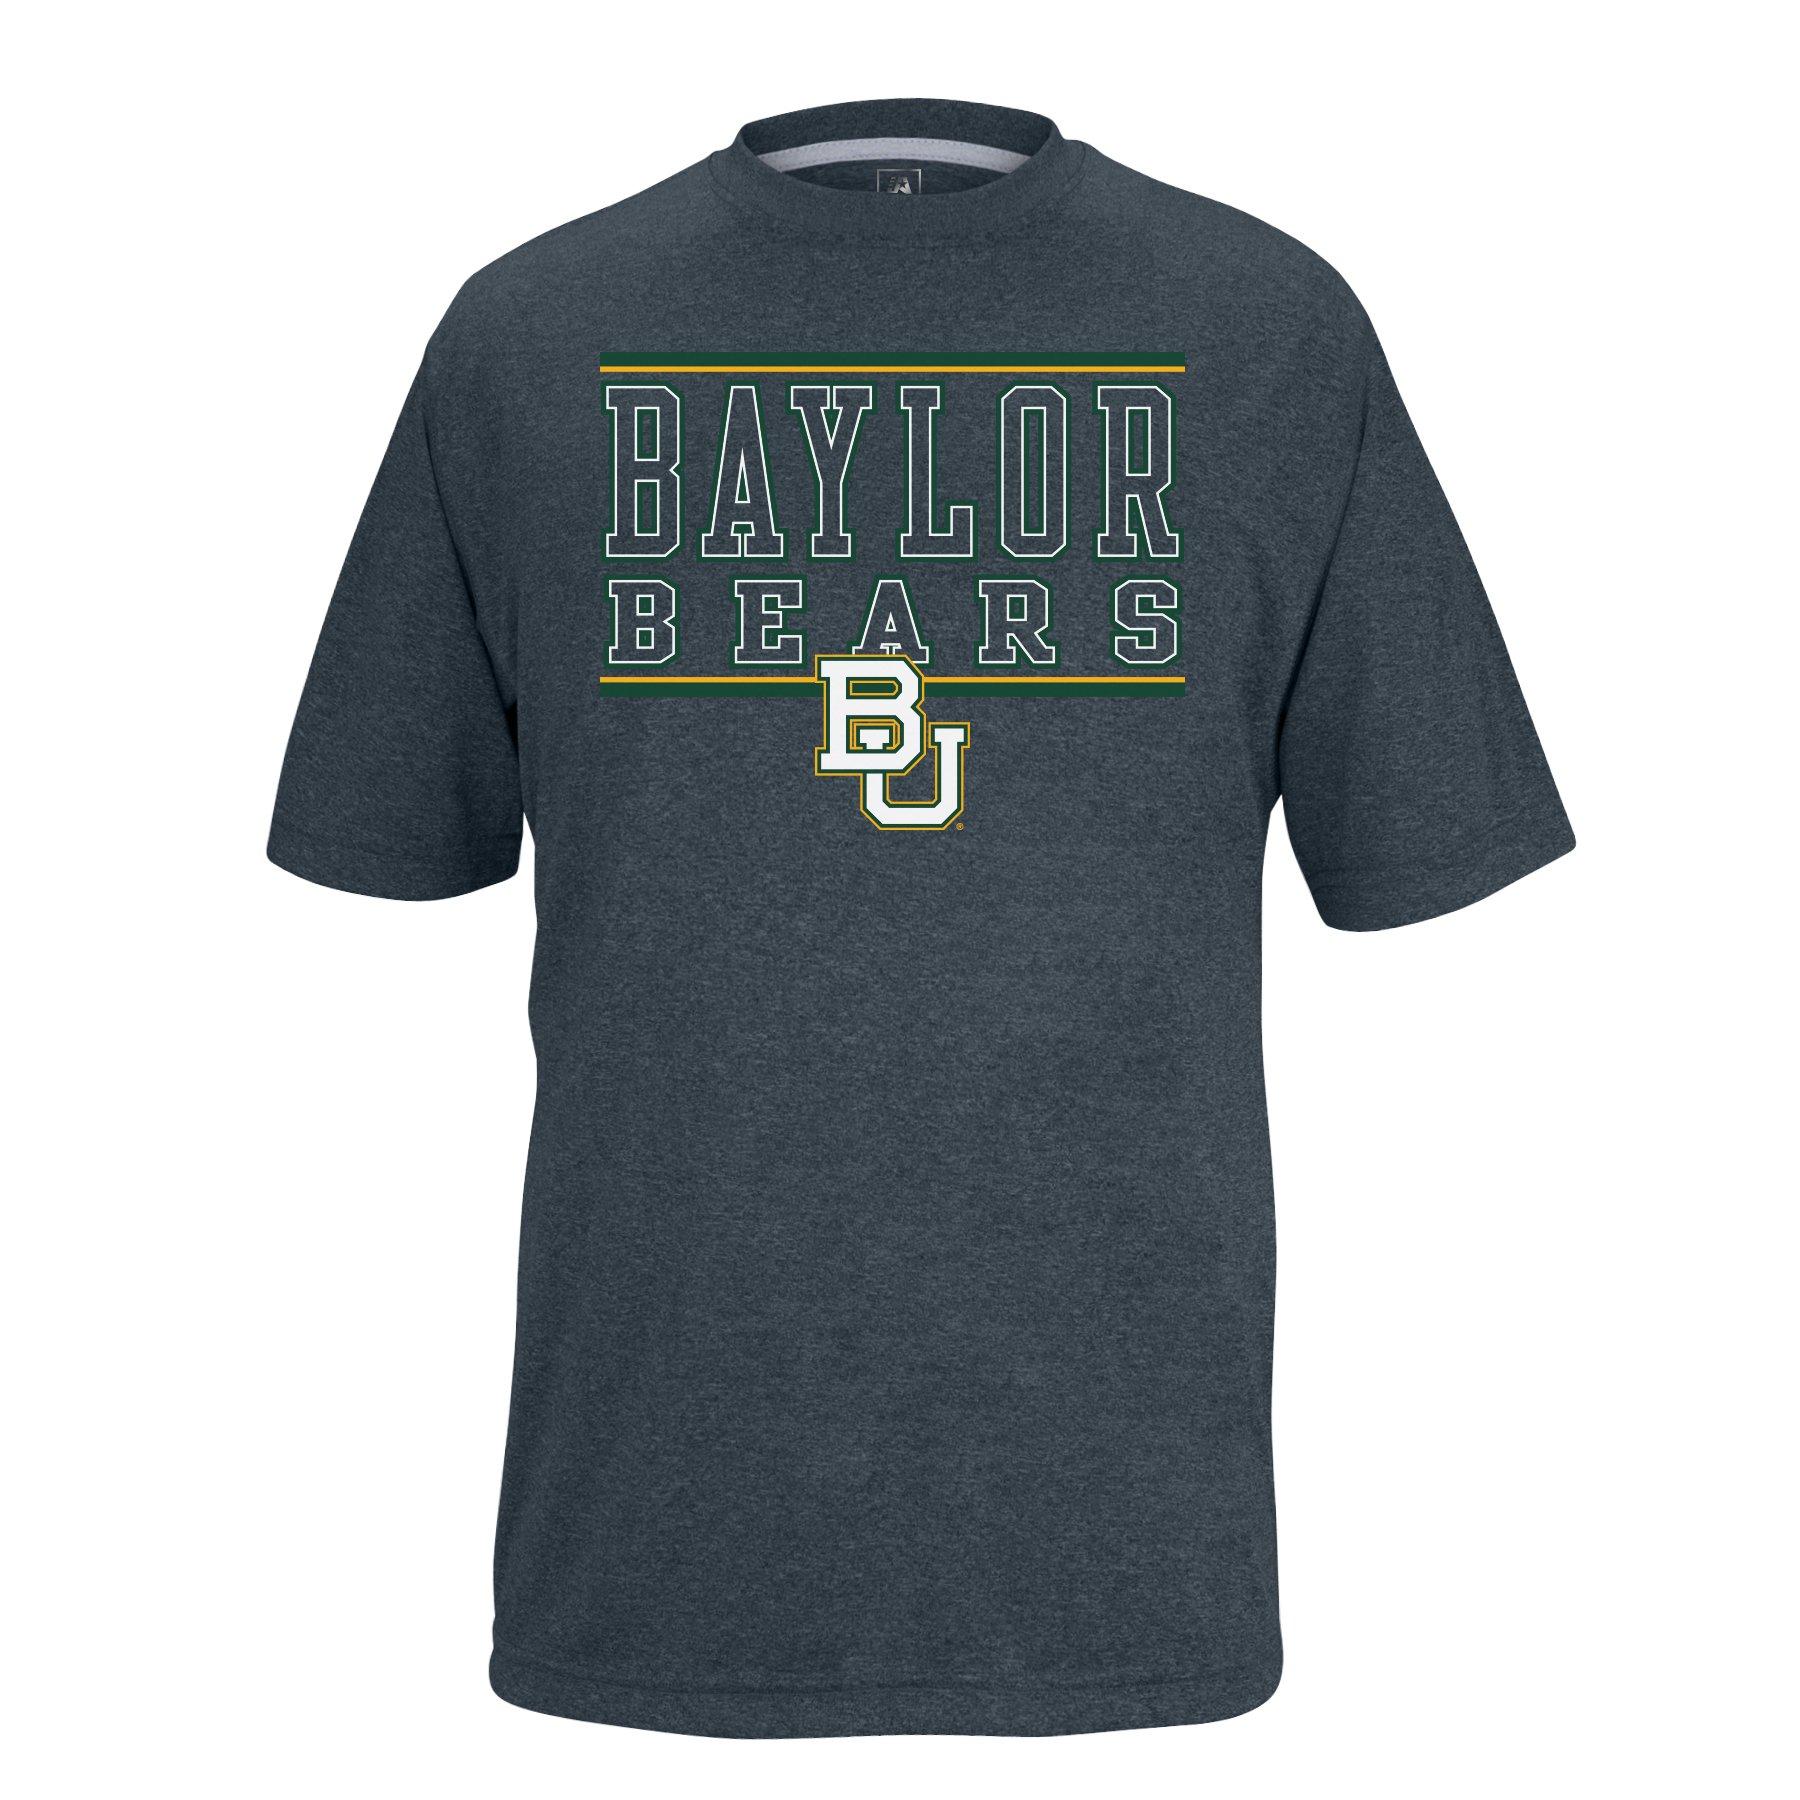 NCAA Baylor Bears Boys Youth Bar Design Vital Poly Tee, Charcoal Heather, Small